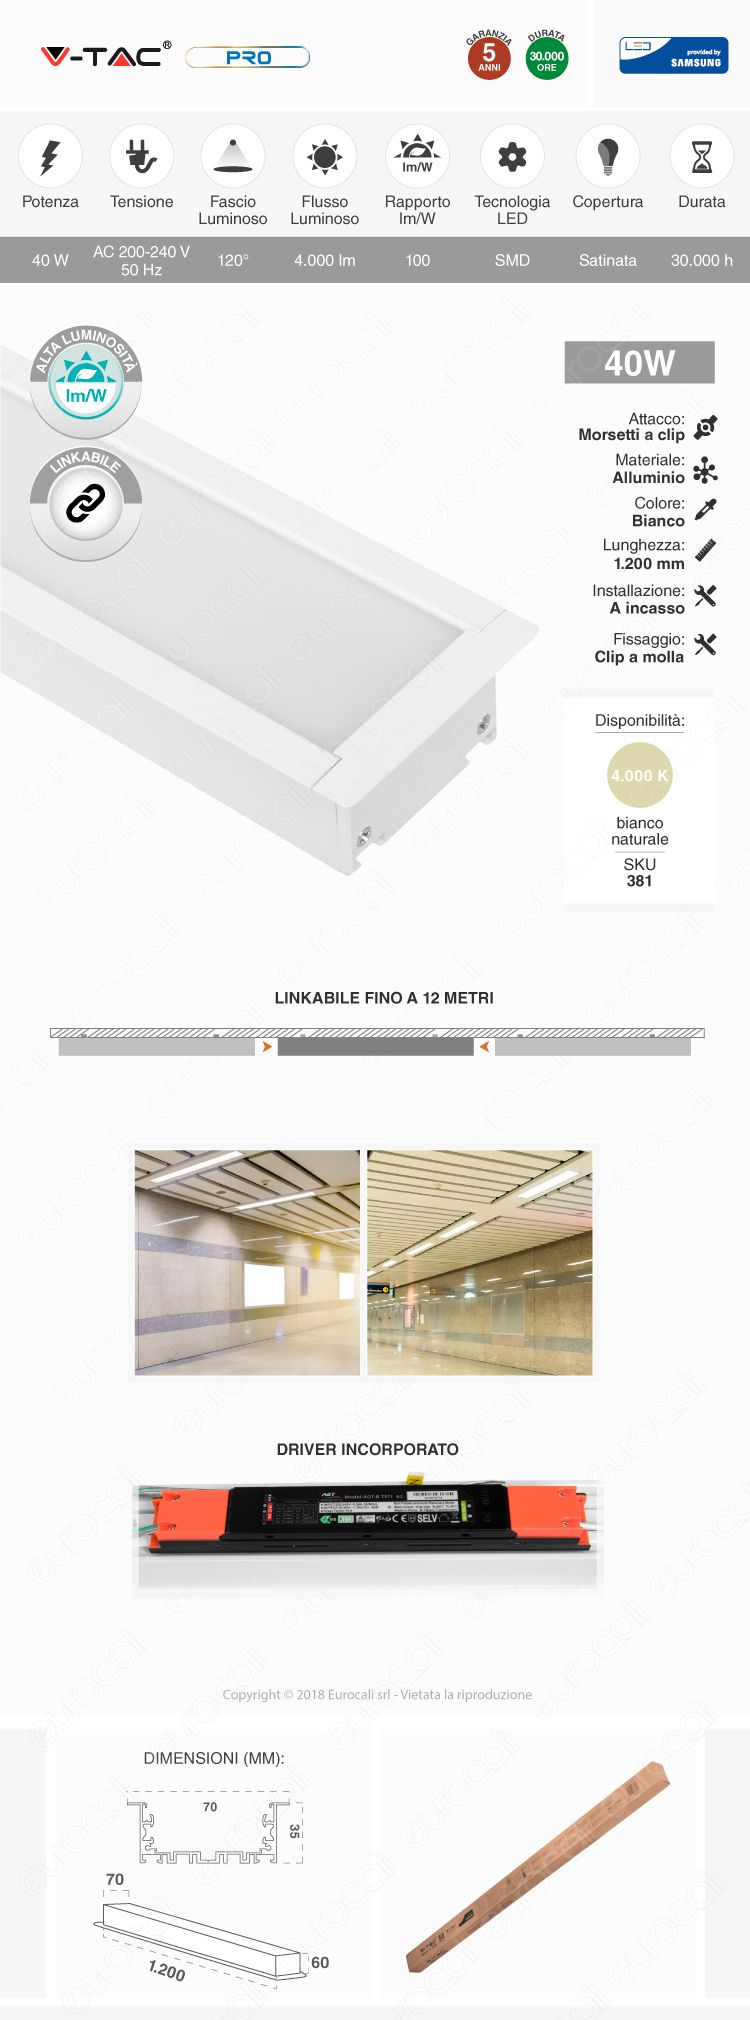 Lampada LED a Sospensione Linear Light 40W Chip Samsung Silver Body V-Tac PRO VT-7-43